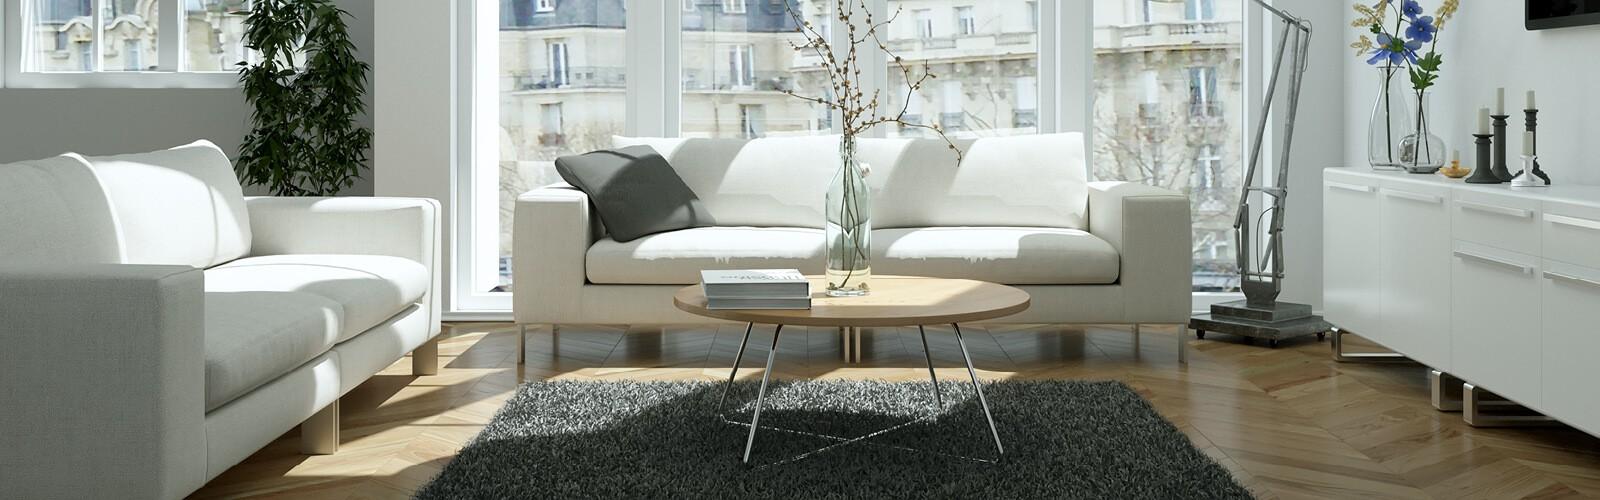 Living room white interior | Boyle's Floor & Window Design